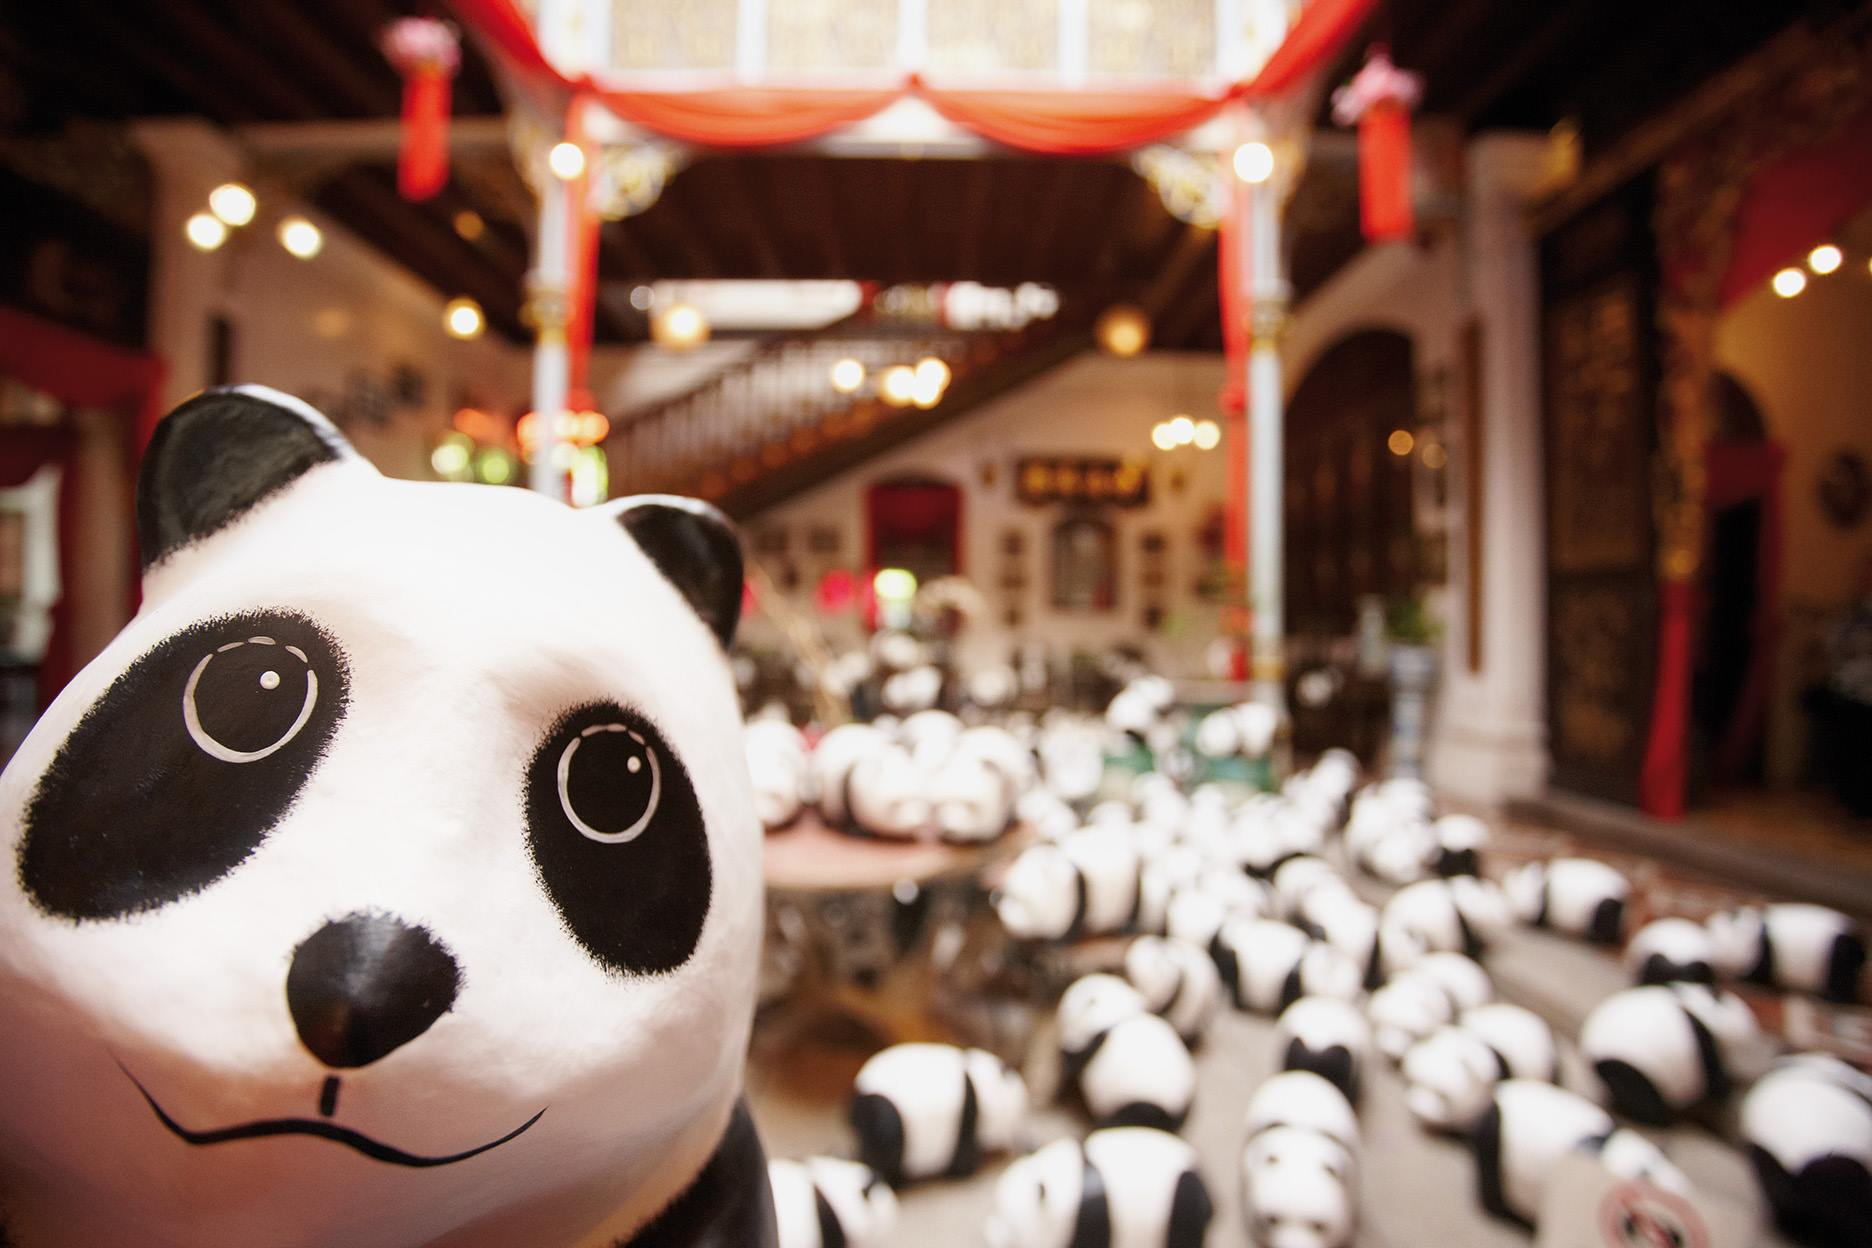 1600-Pandas-Malaisie-4